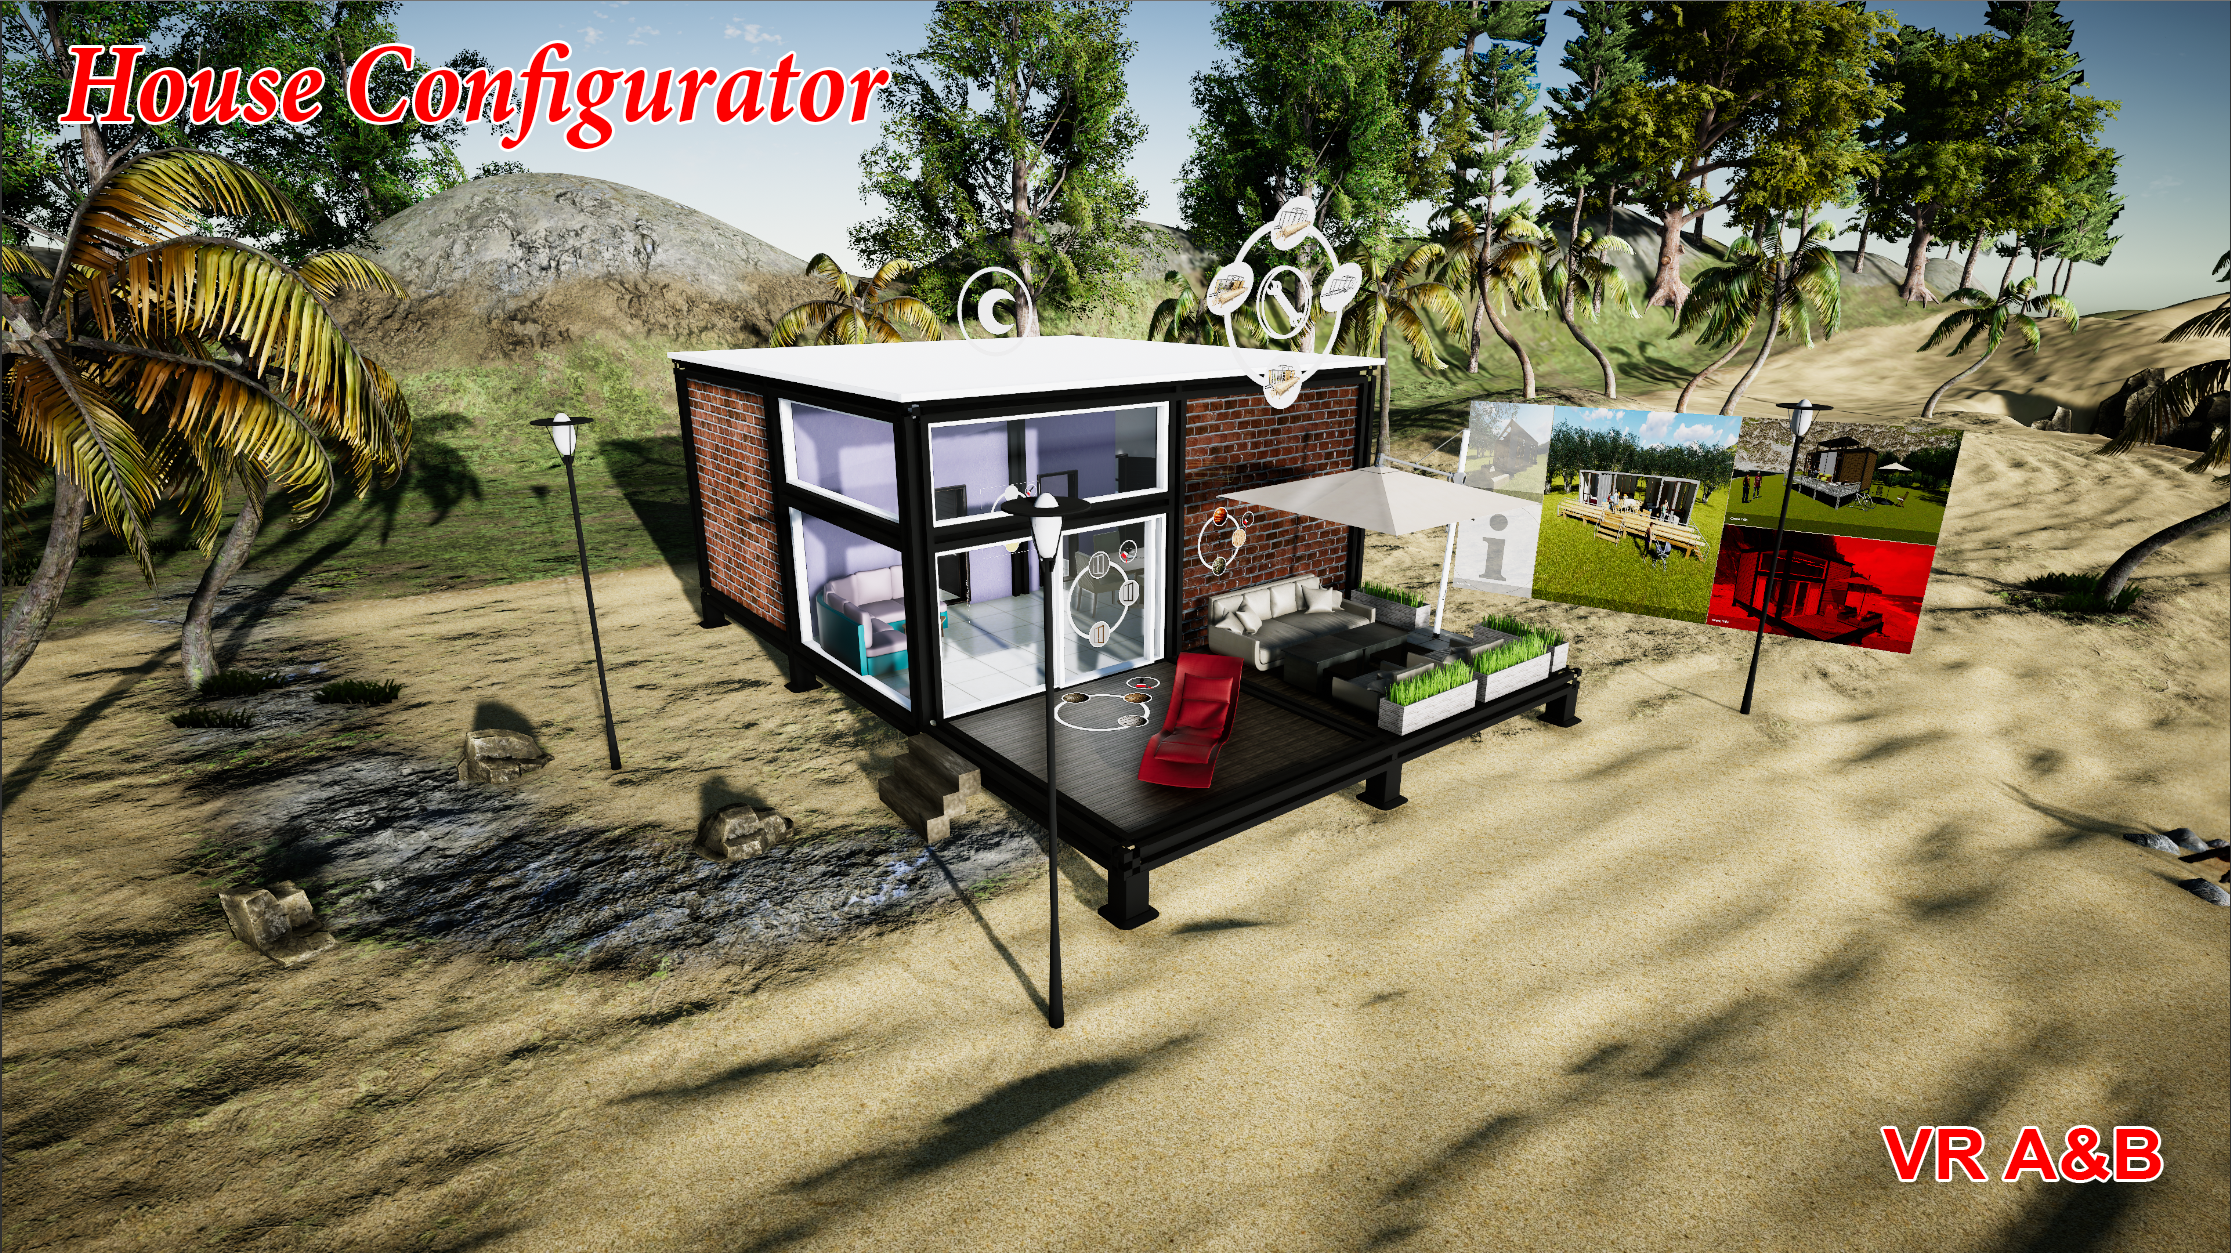 VR A&B House Configurator